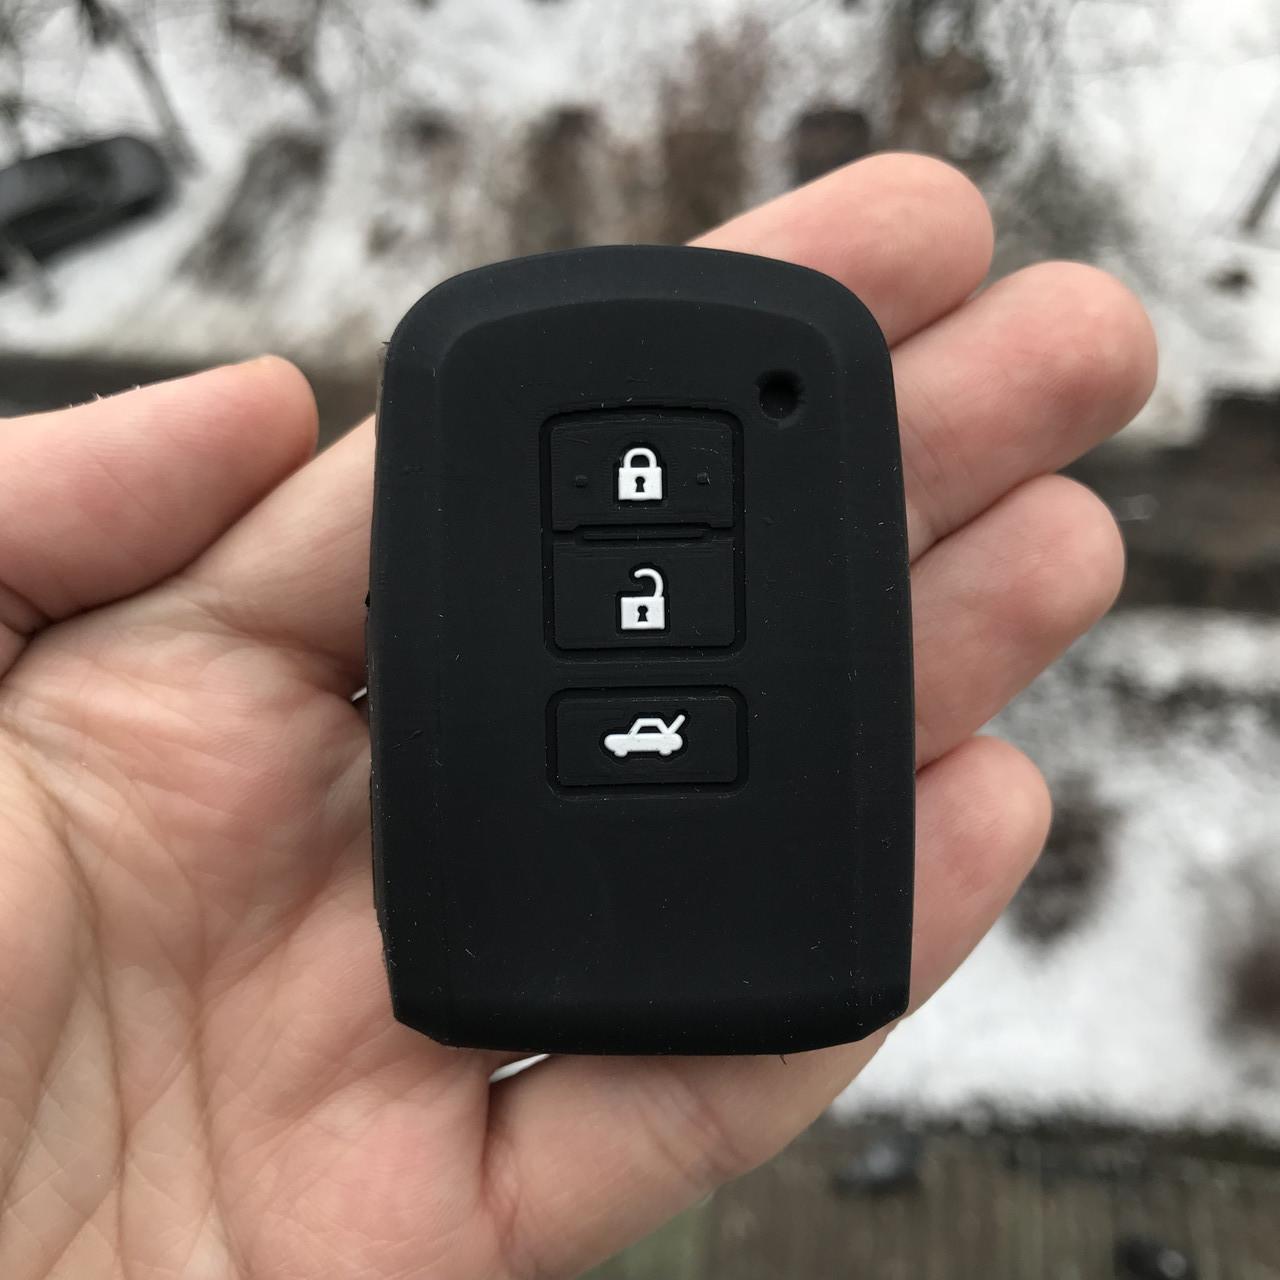 Силиконовый чехол для ключа Toyota Yaris,Auris,Highlander, Land Cruiser,Rav4,Camry,Corolla, Avalon,Avensis